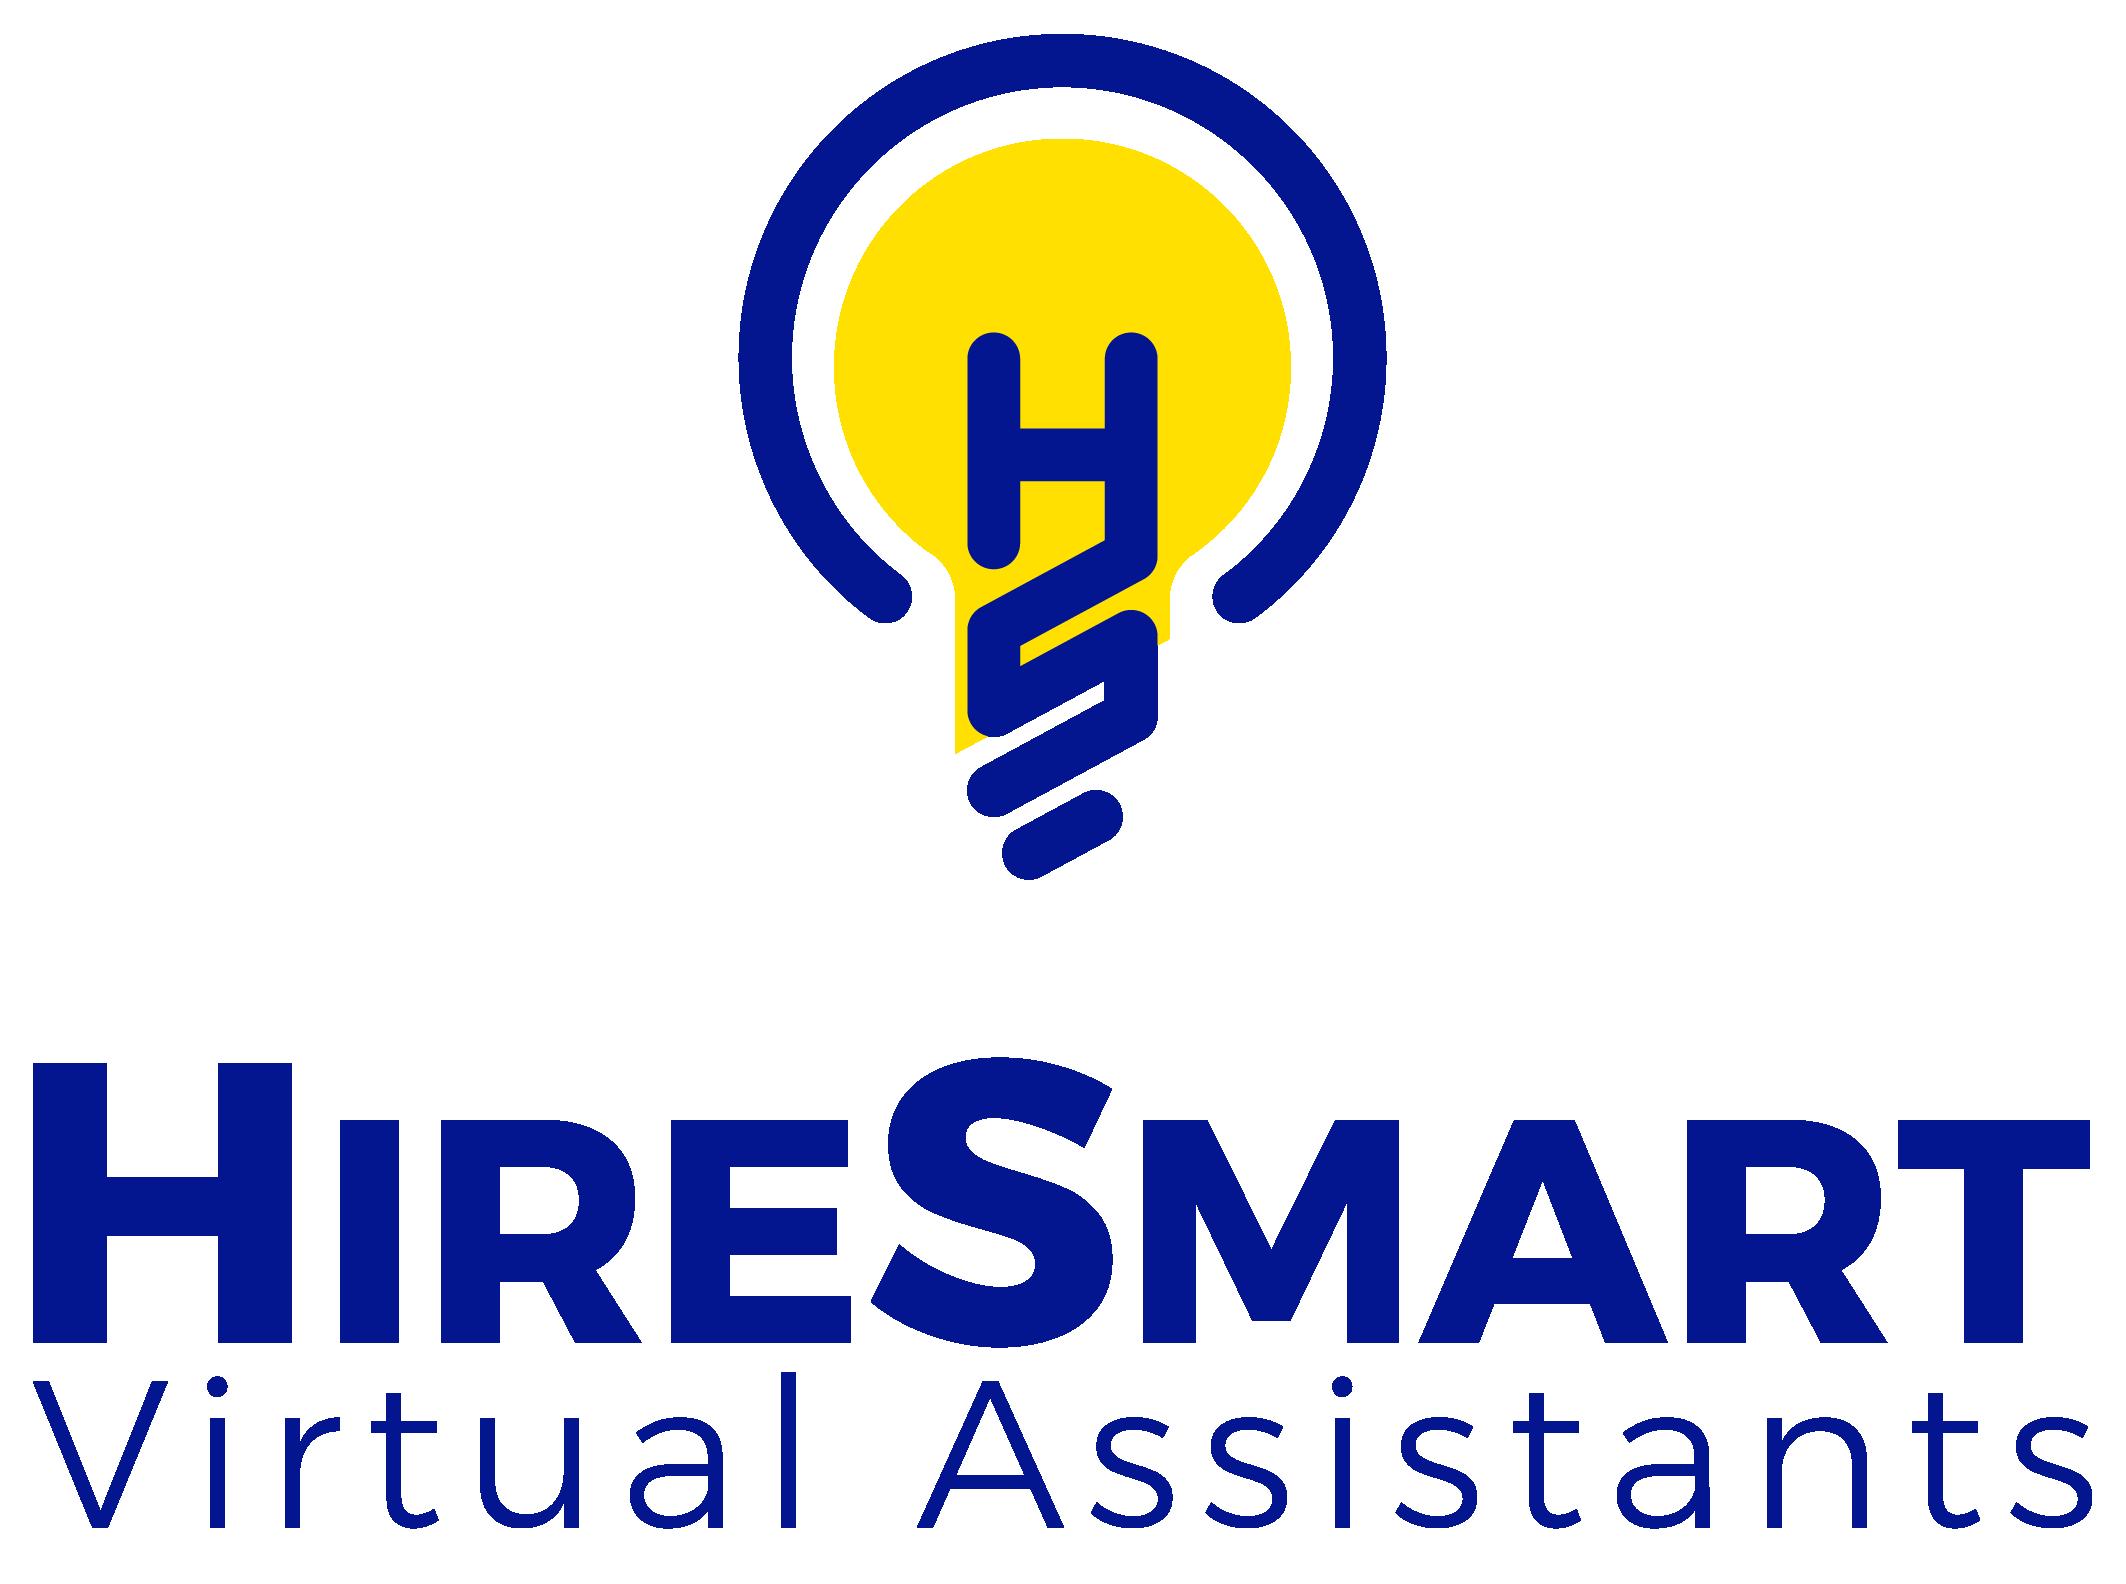 HireSmart Virtual Assistants